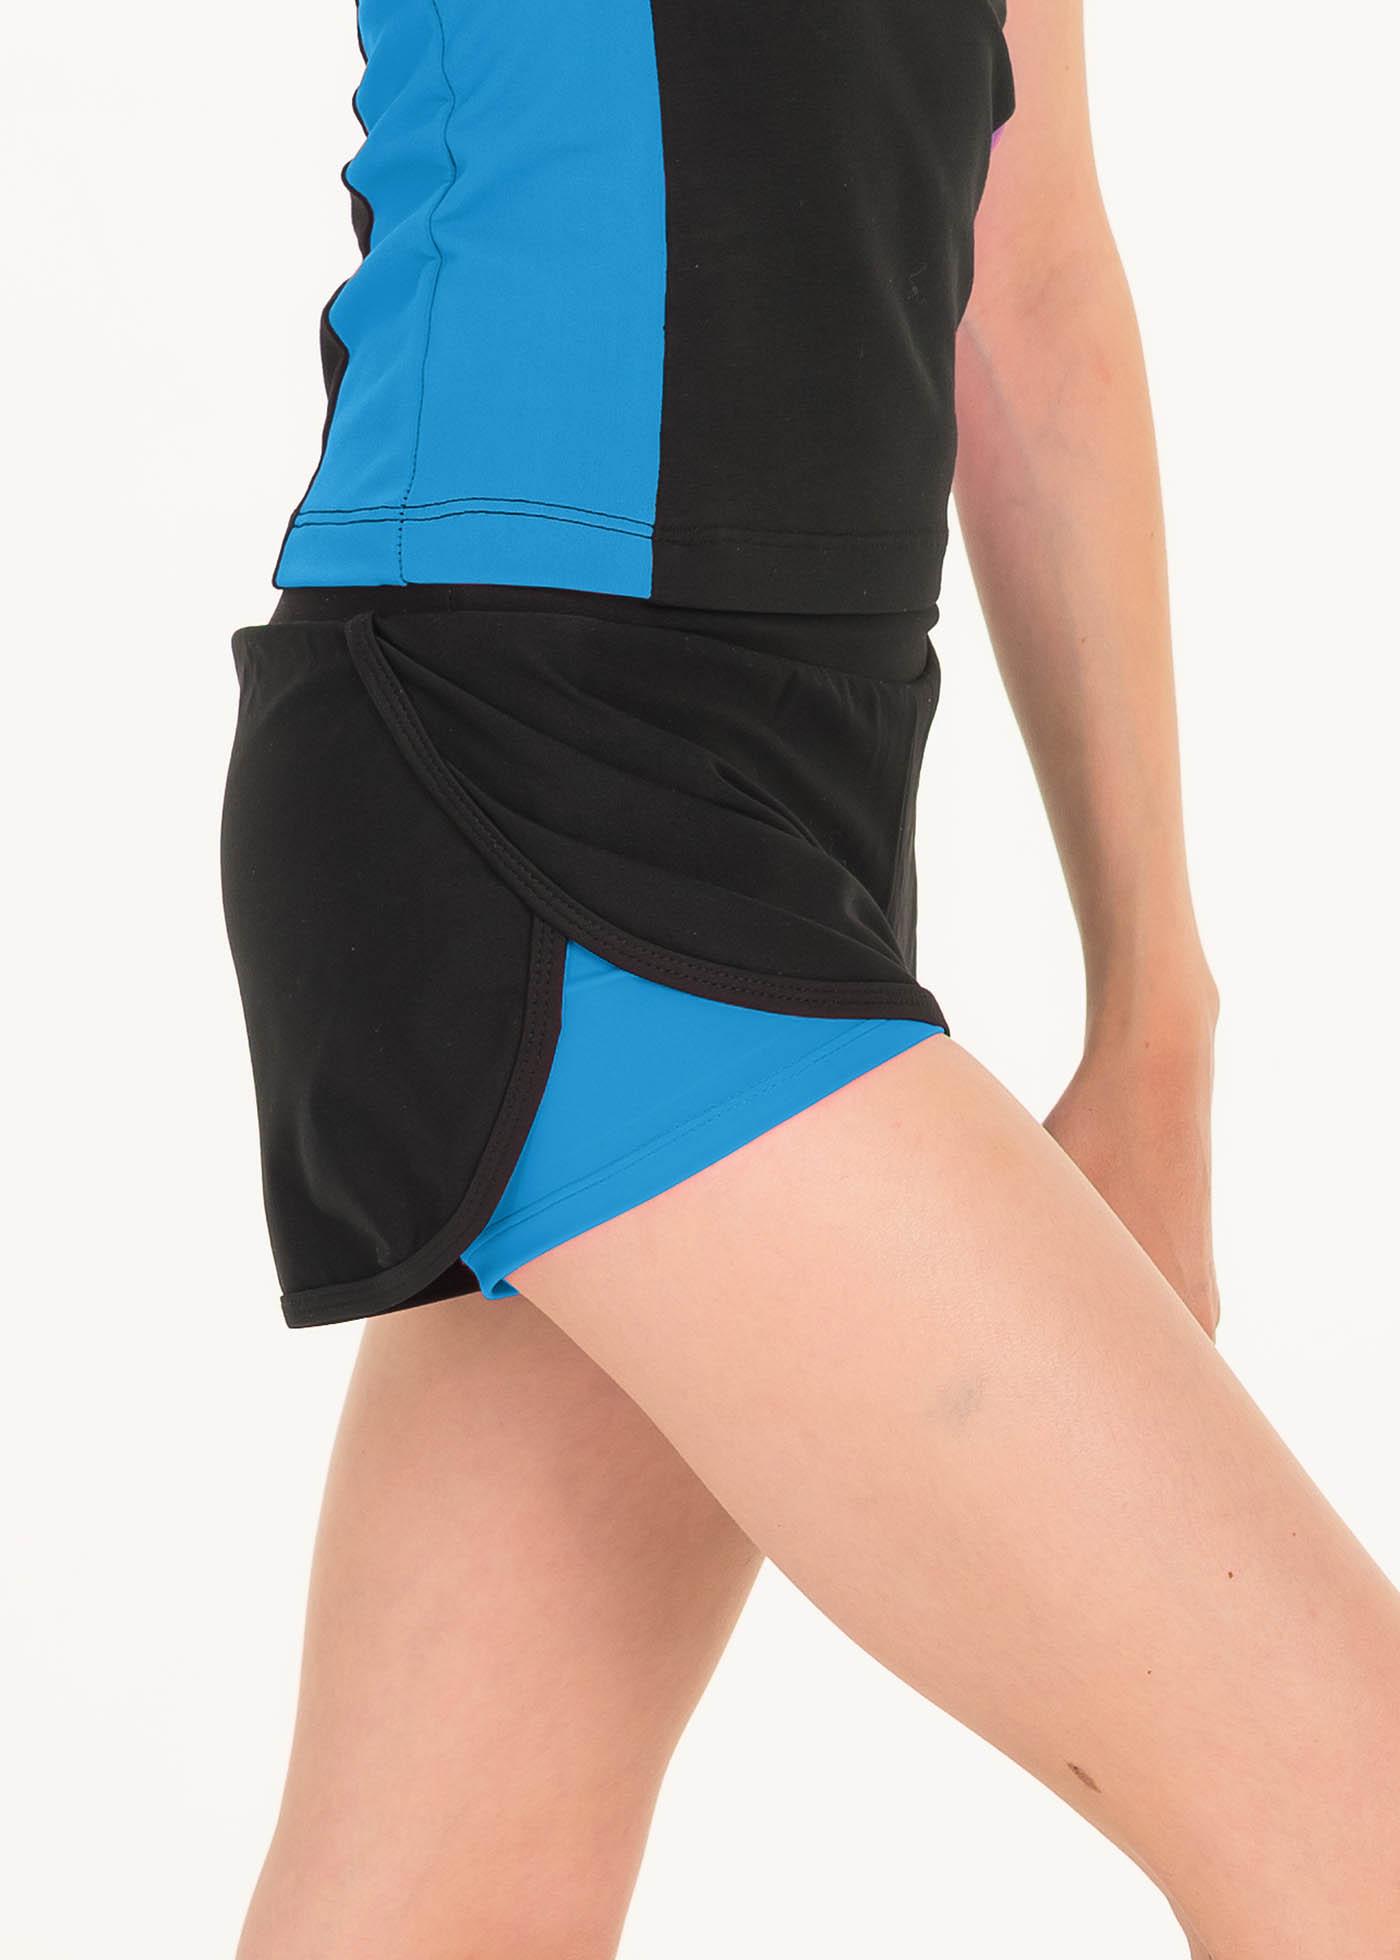 Shorts, Double shorts Gudvin, blue, pic 5